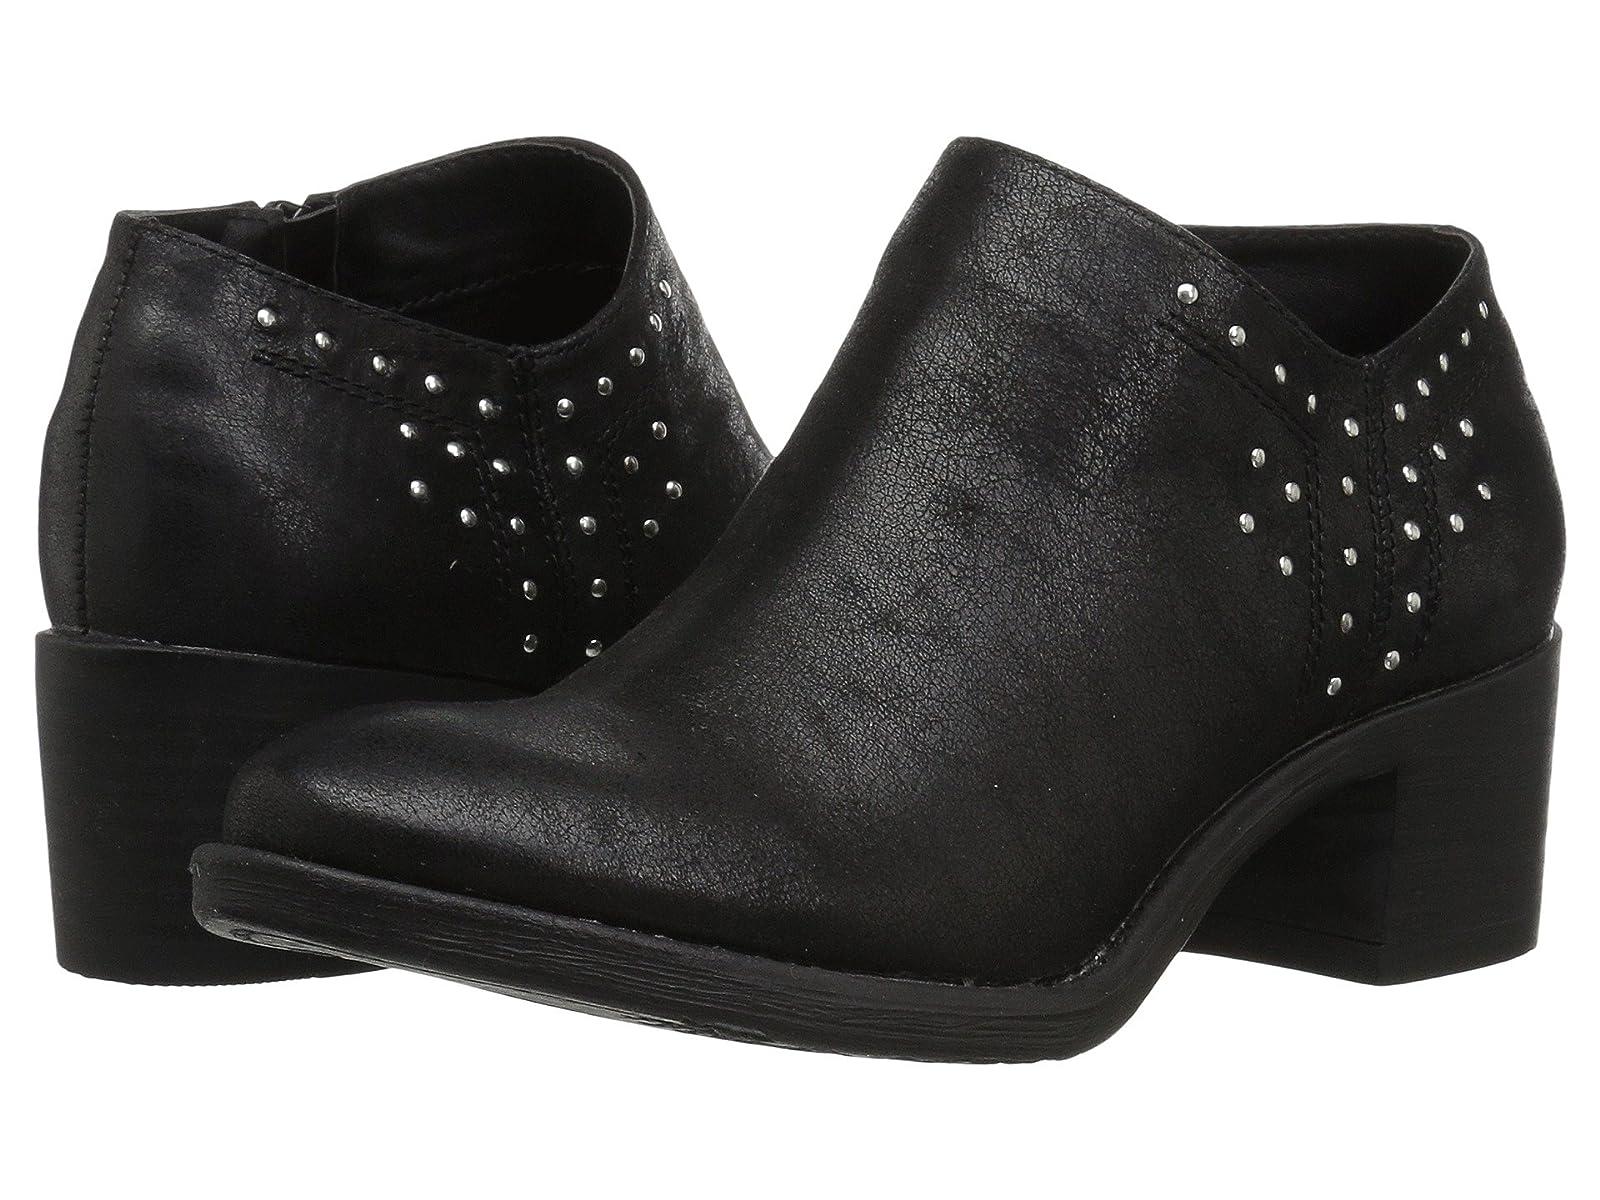 CARLOS by Carlos Santana ConroyCheap and distinctive eye-catching shoes